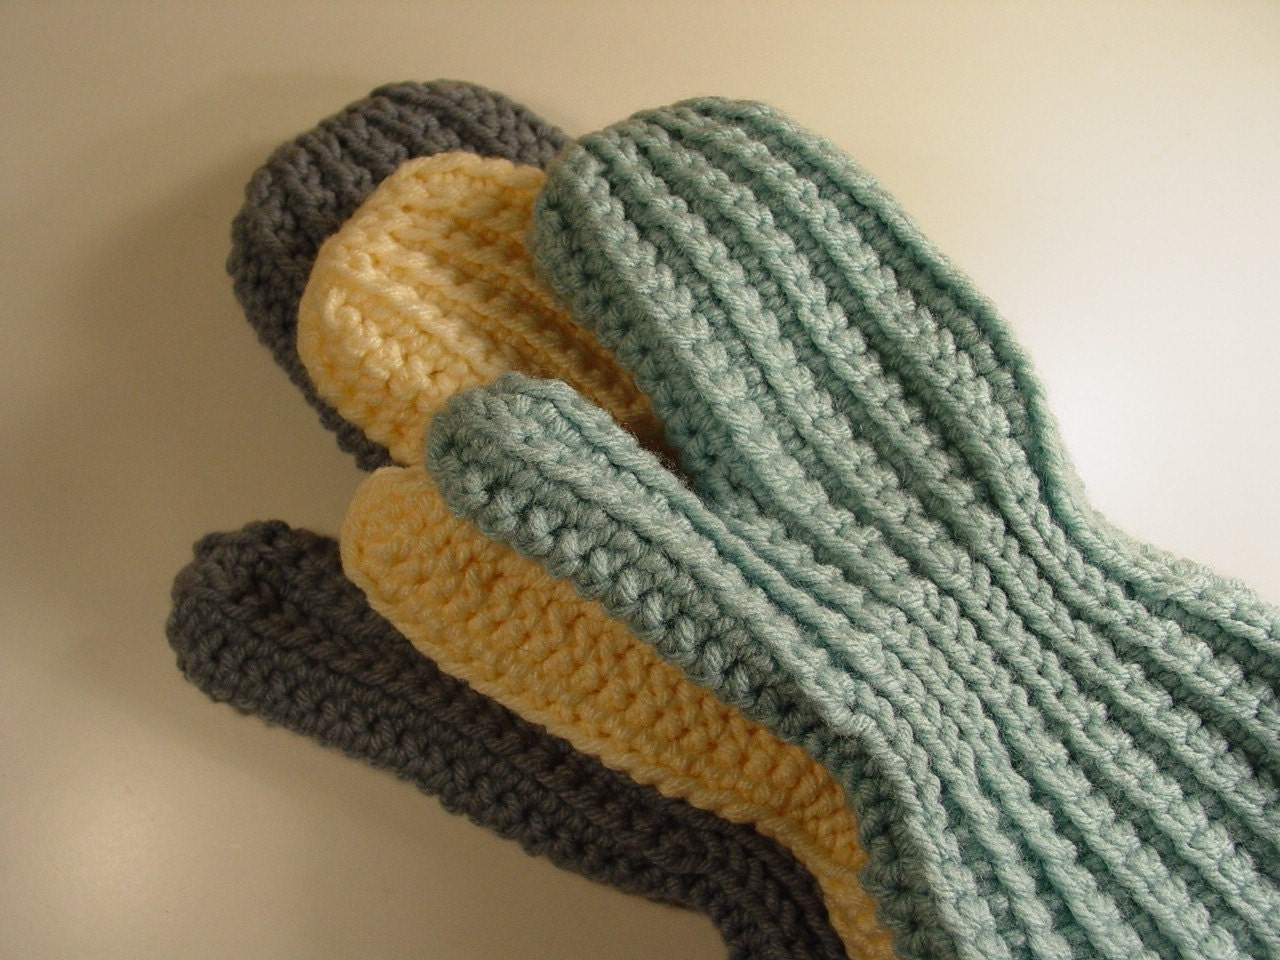 Crochet gloves pattern for beginners dancox for easy sideways crochet mittens pattern pdf by madcowdog on etsy bankloansurffo Images